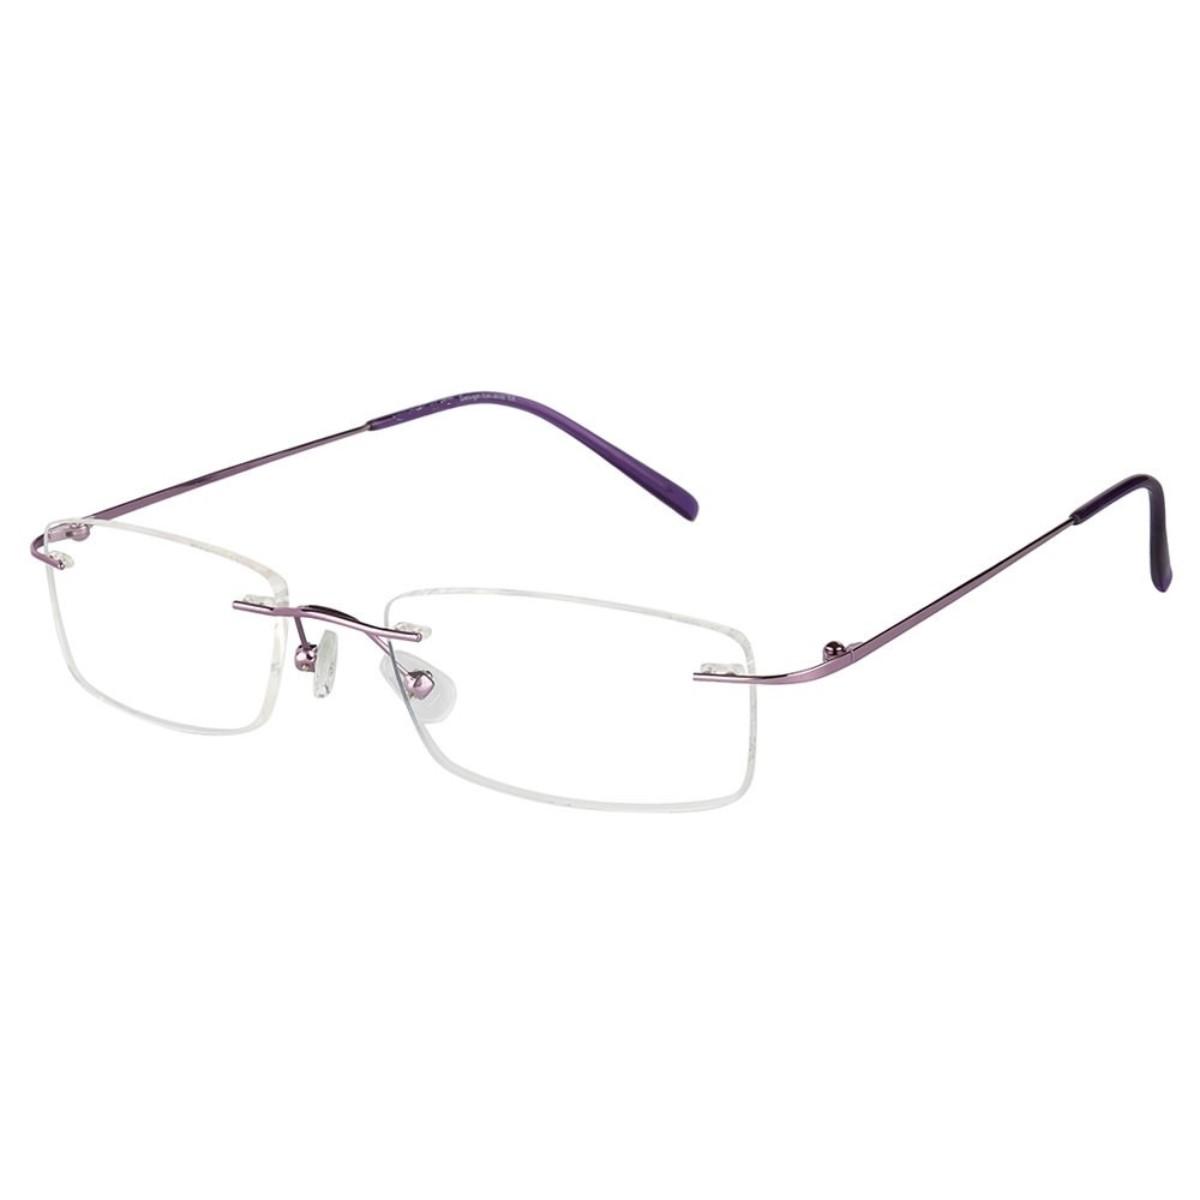 Purple Rimless Computer Glasses with Anti Glare Coating